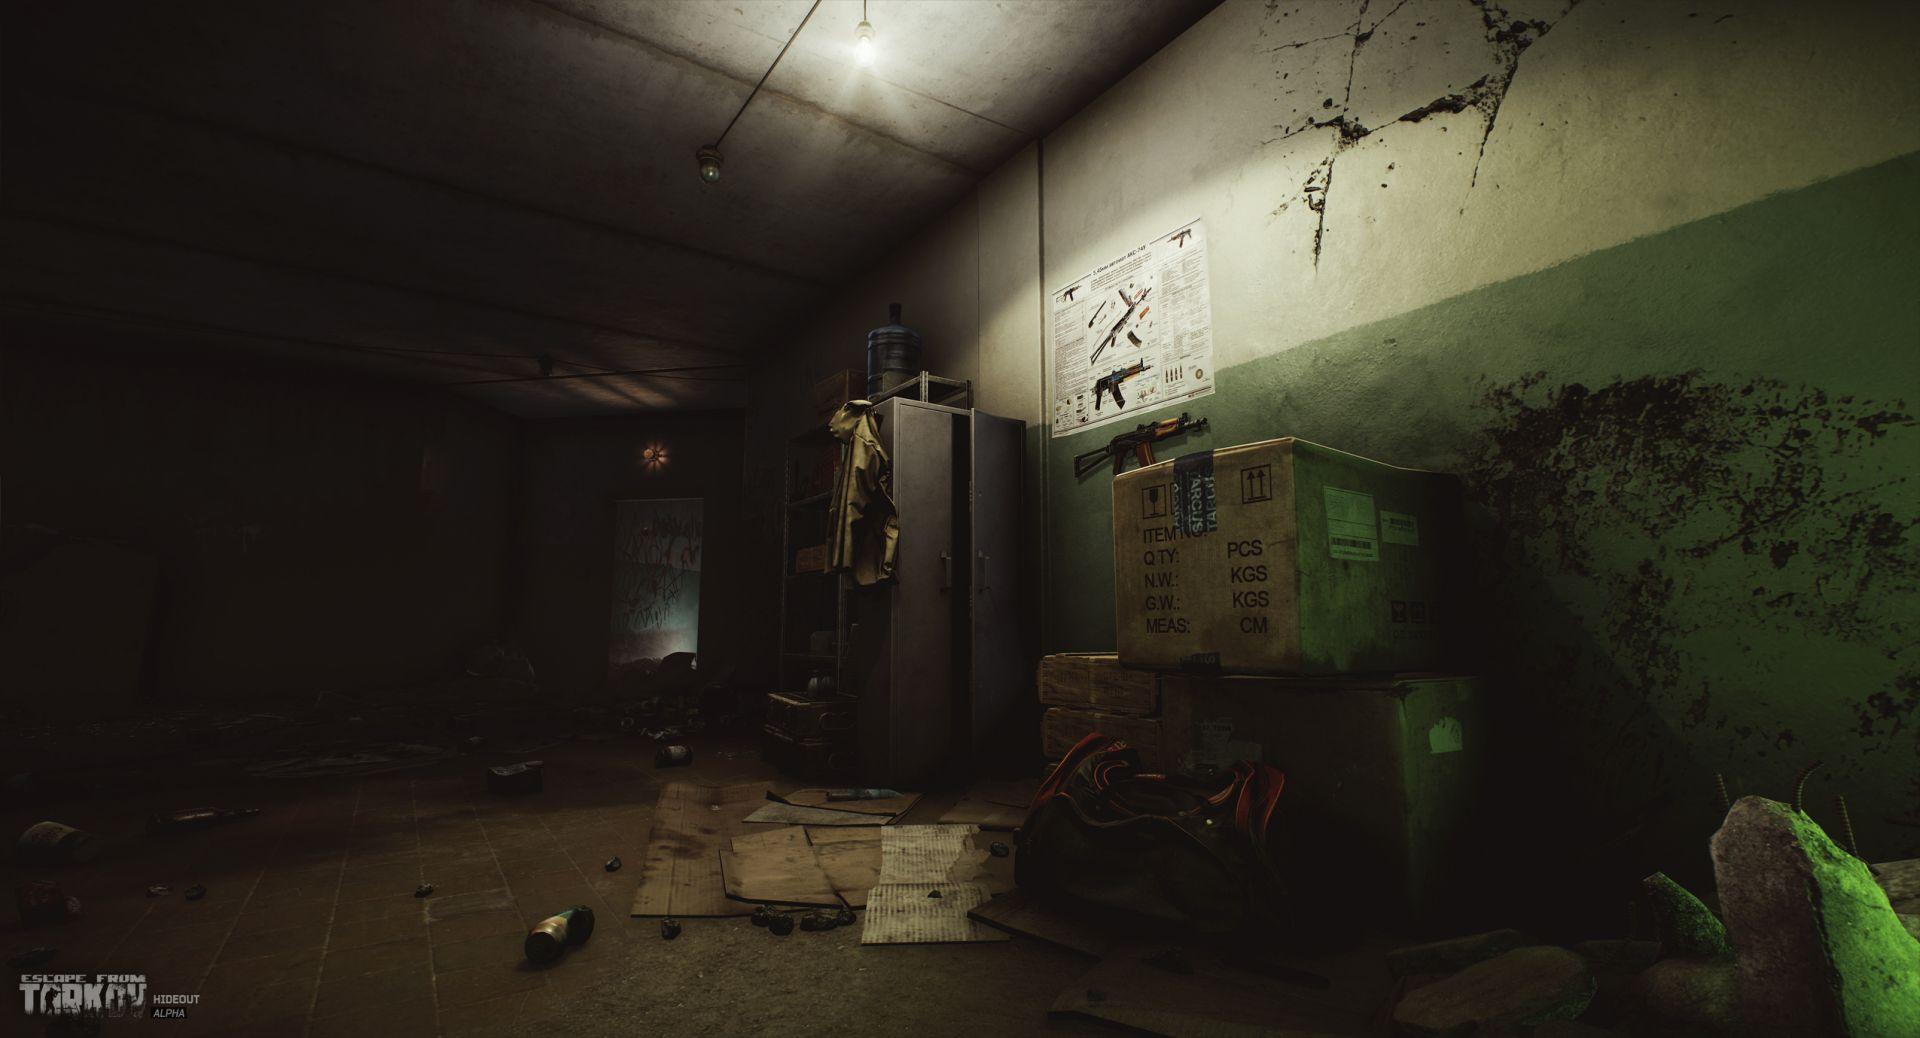 escapefromtarkov_hideout6